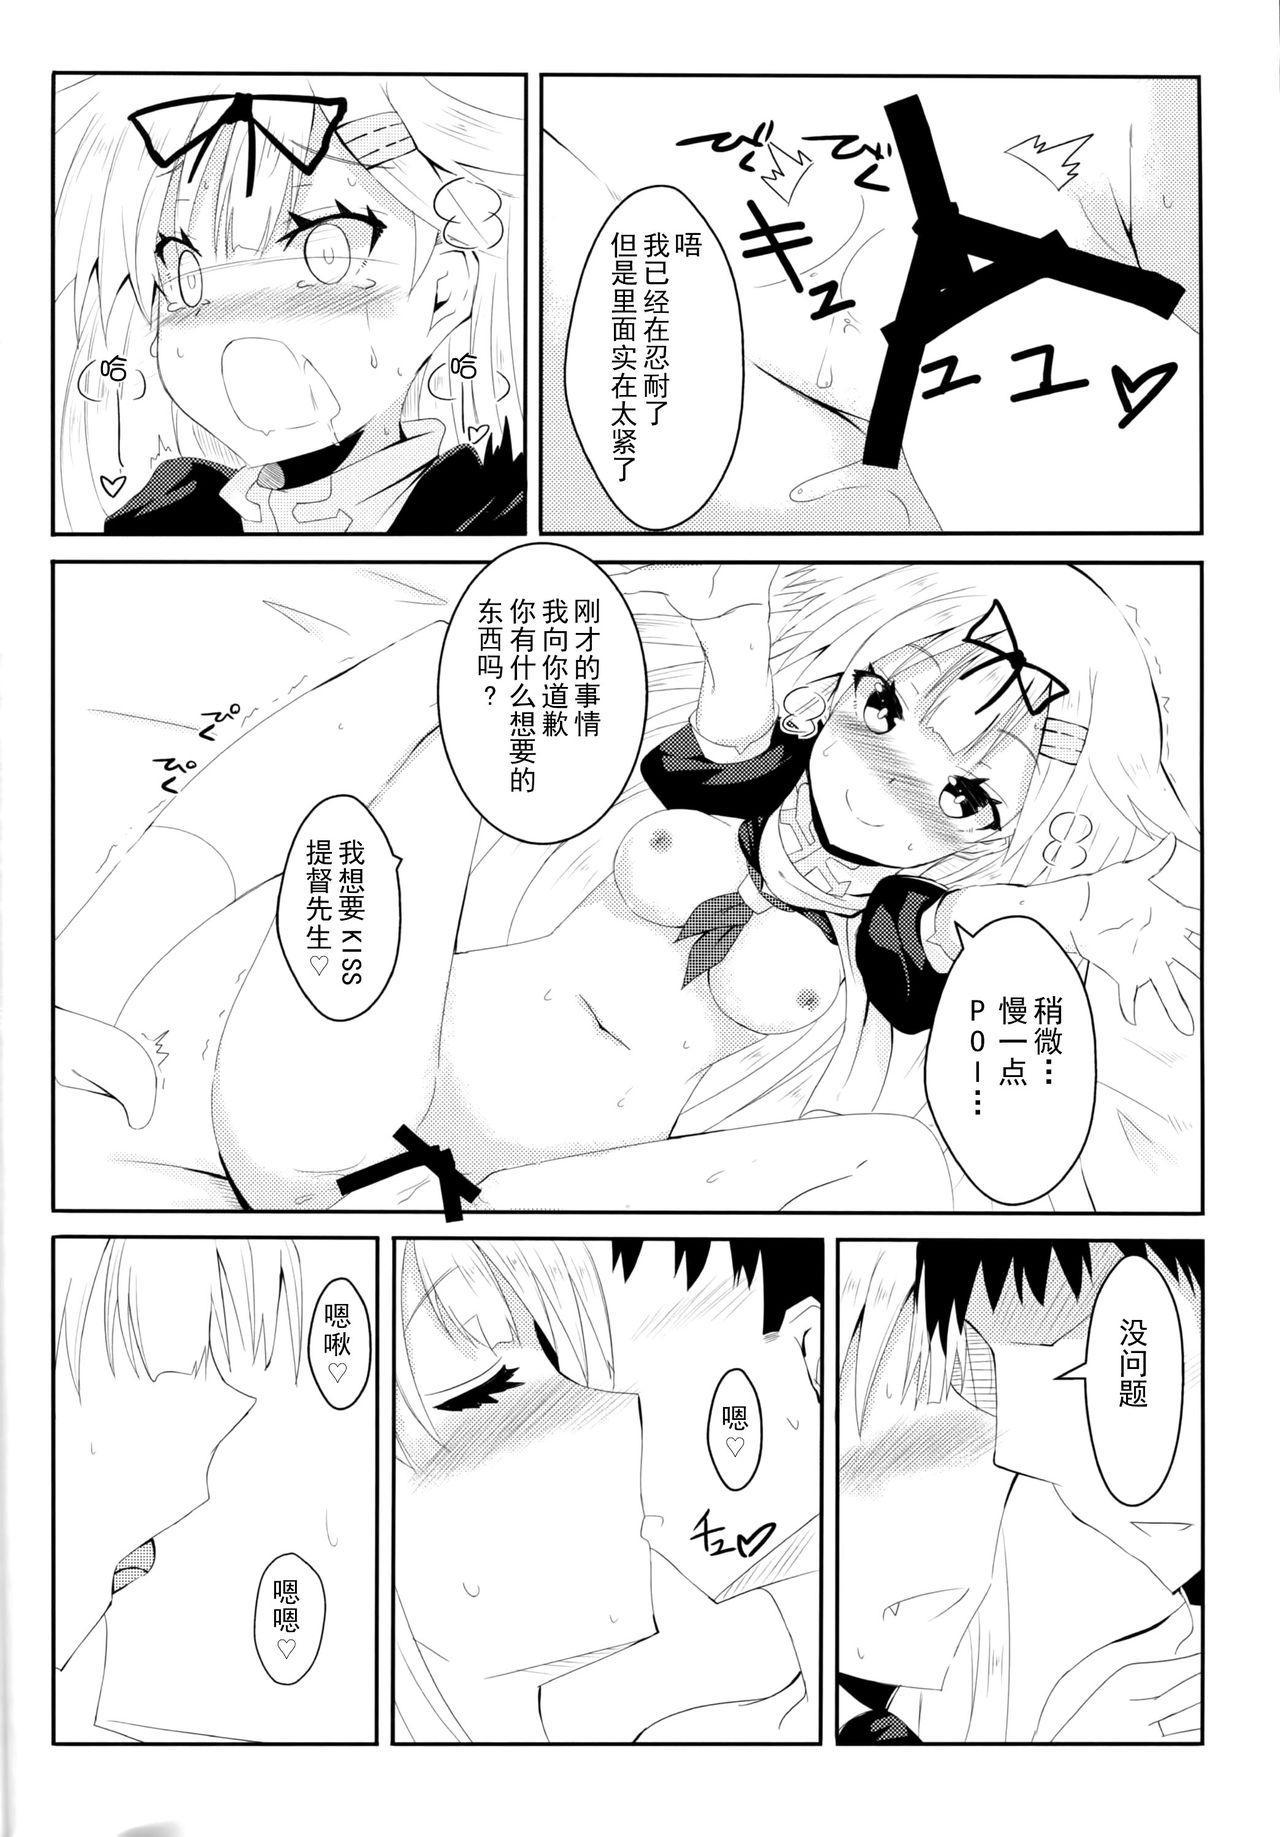 Yuudachi Skinship 13